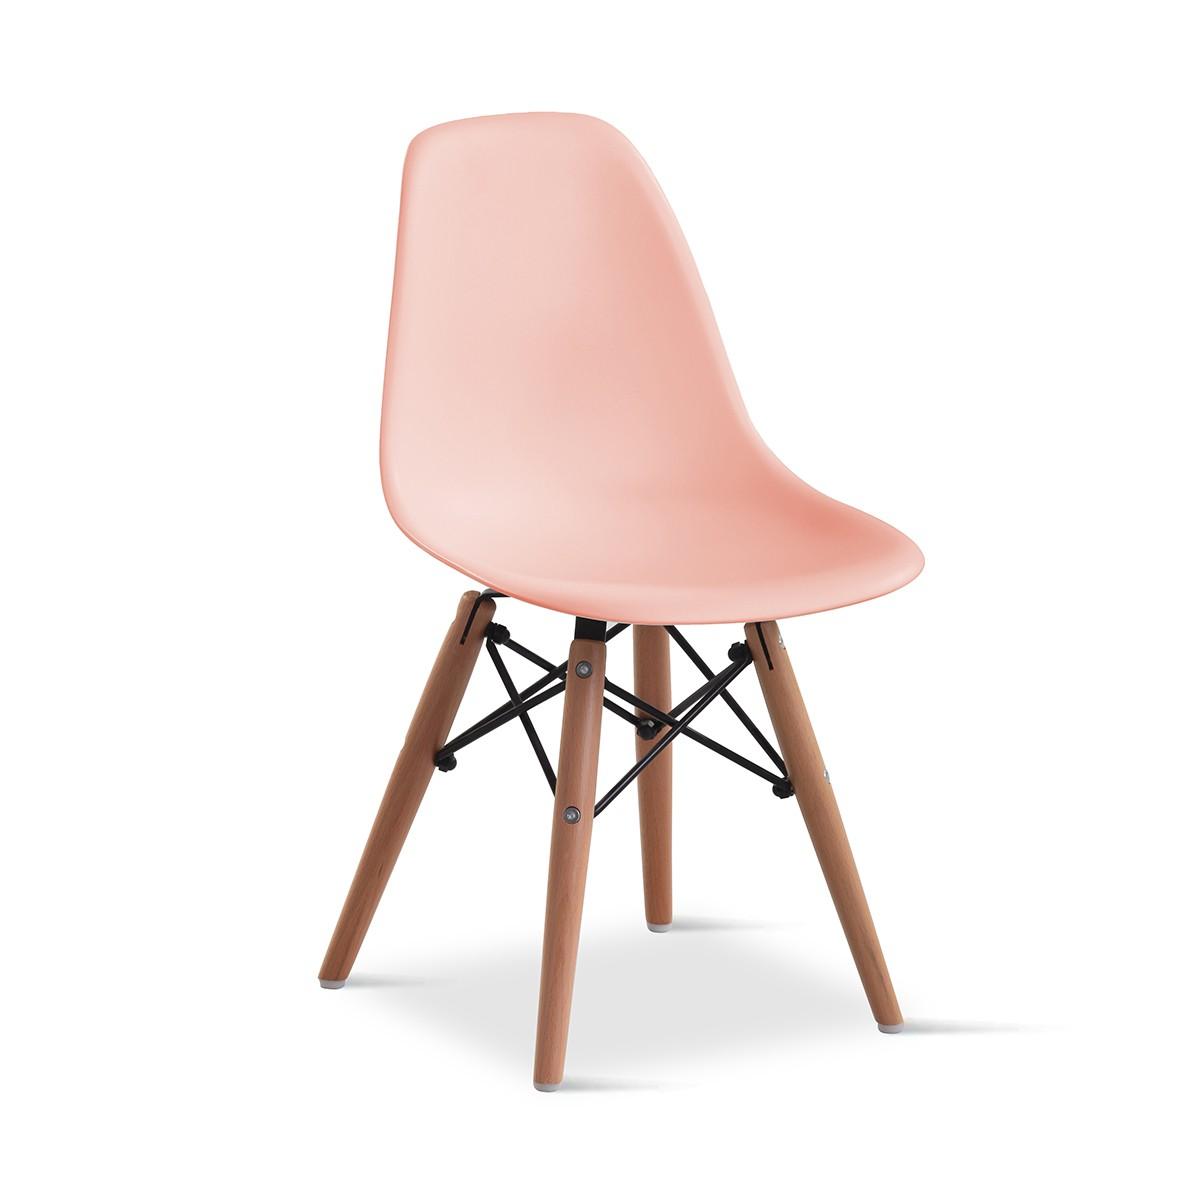 Cadeira Eames Infantil Rosa - Base Madeira Natural